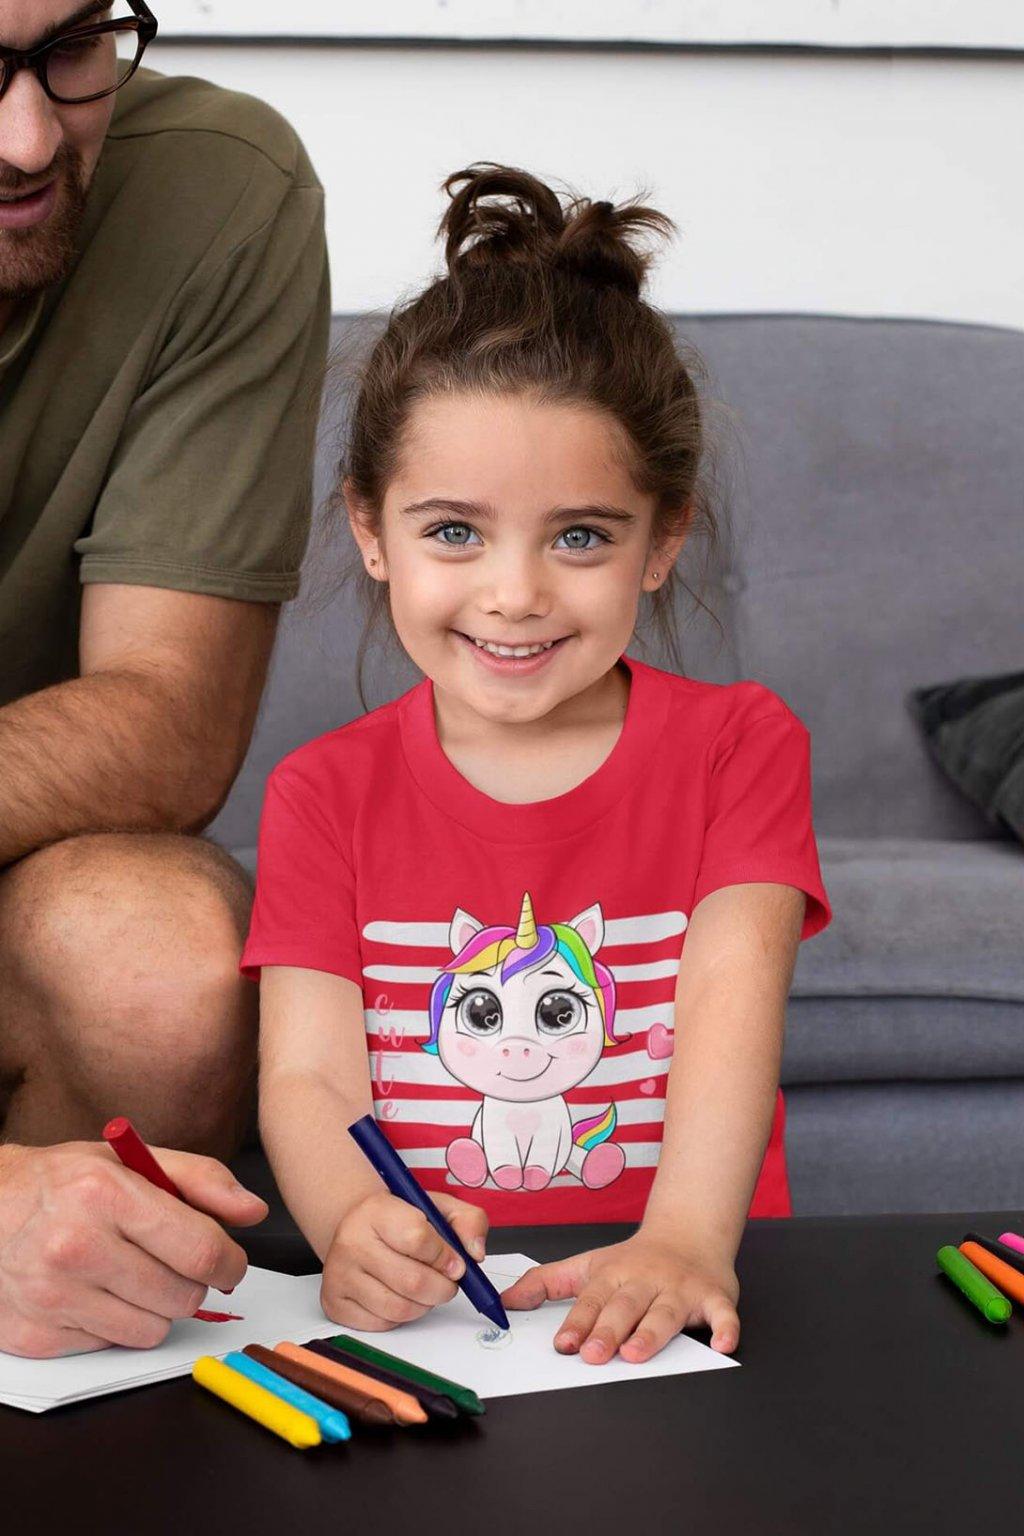 Dievčenské tričko Cute jednorožec